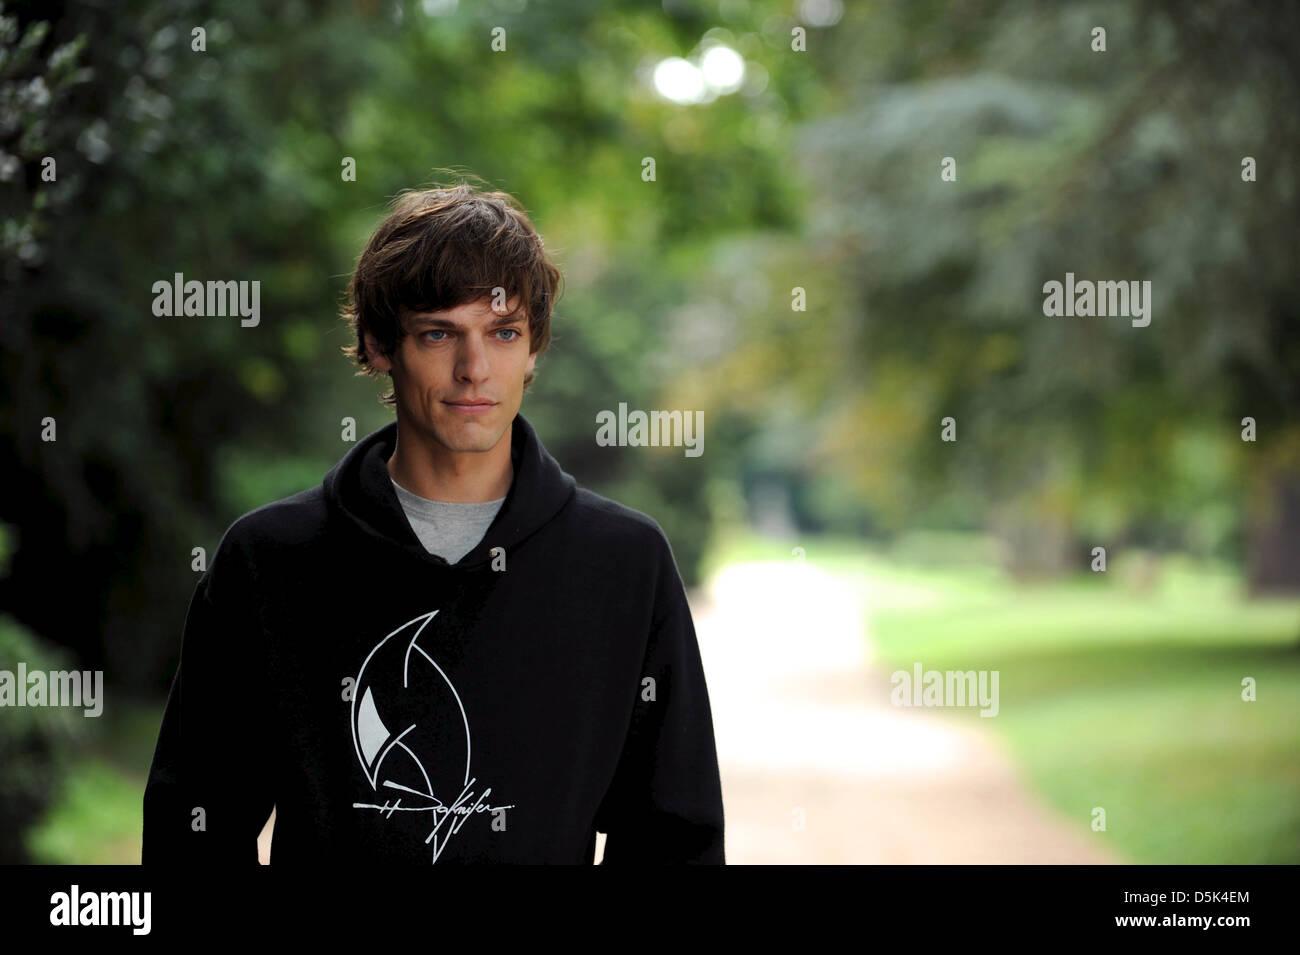 MARTIN CANNAVÒ MA PREMIERE FOIS; MEIN ERSTES (2012) Stockbild